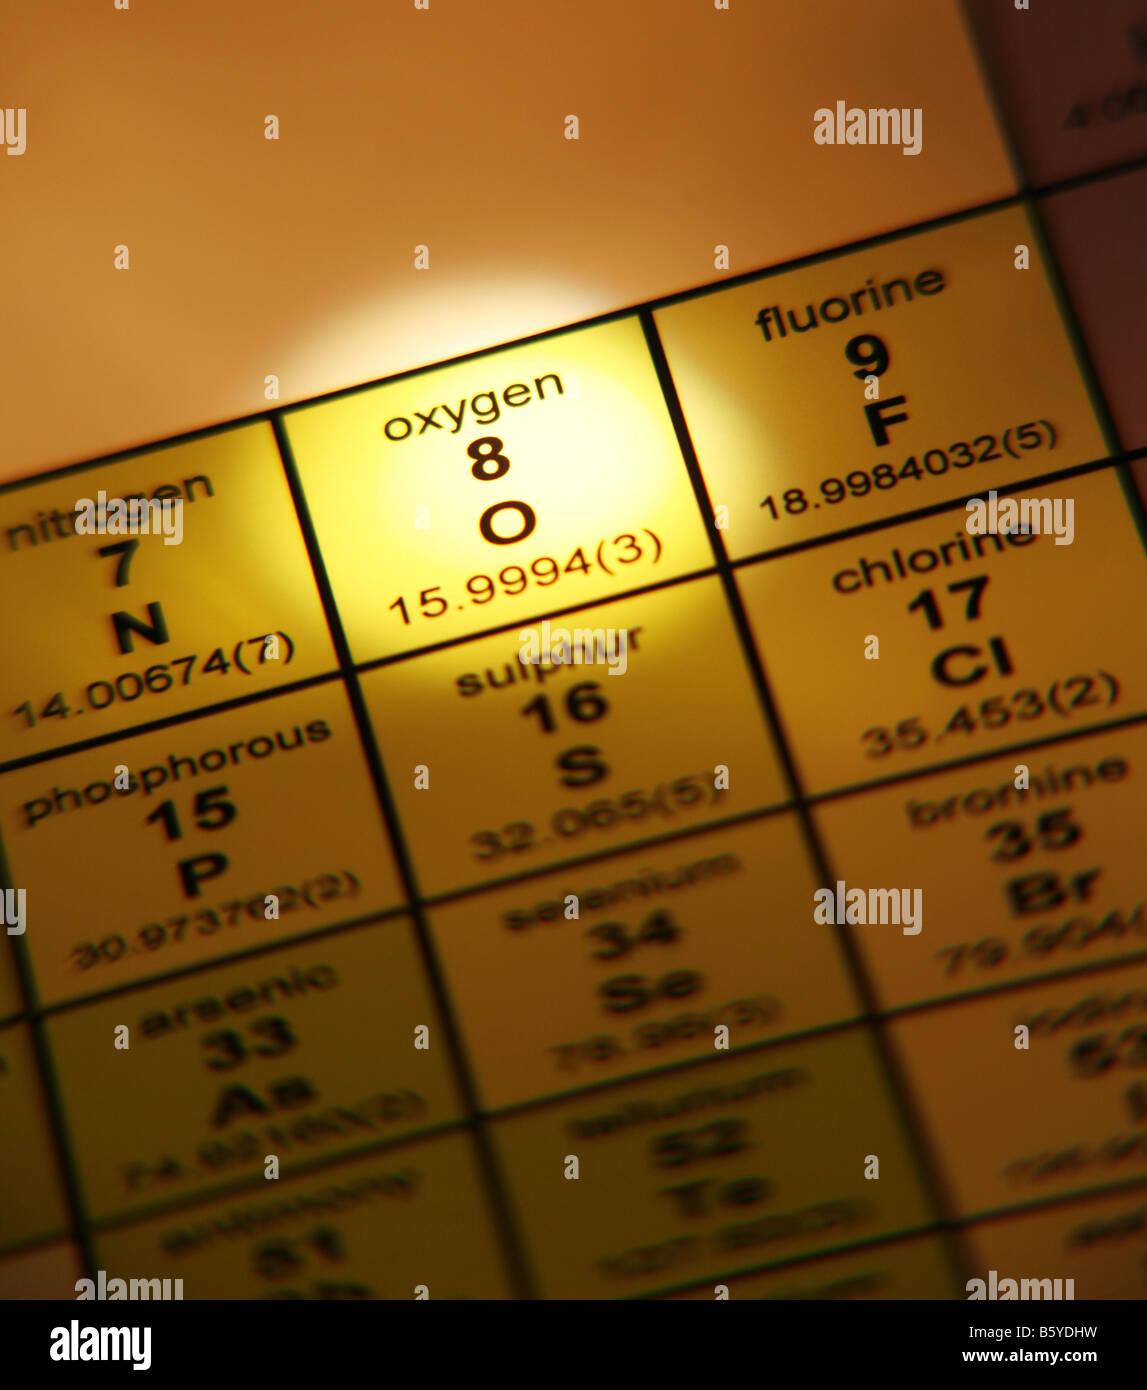 Periodic Table Elements Oxygen Stock Photos Periodic Table